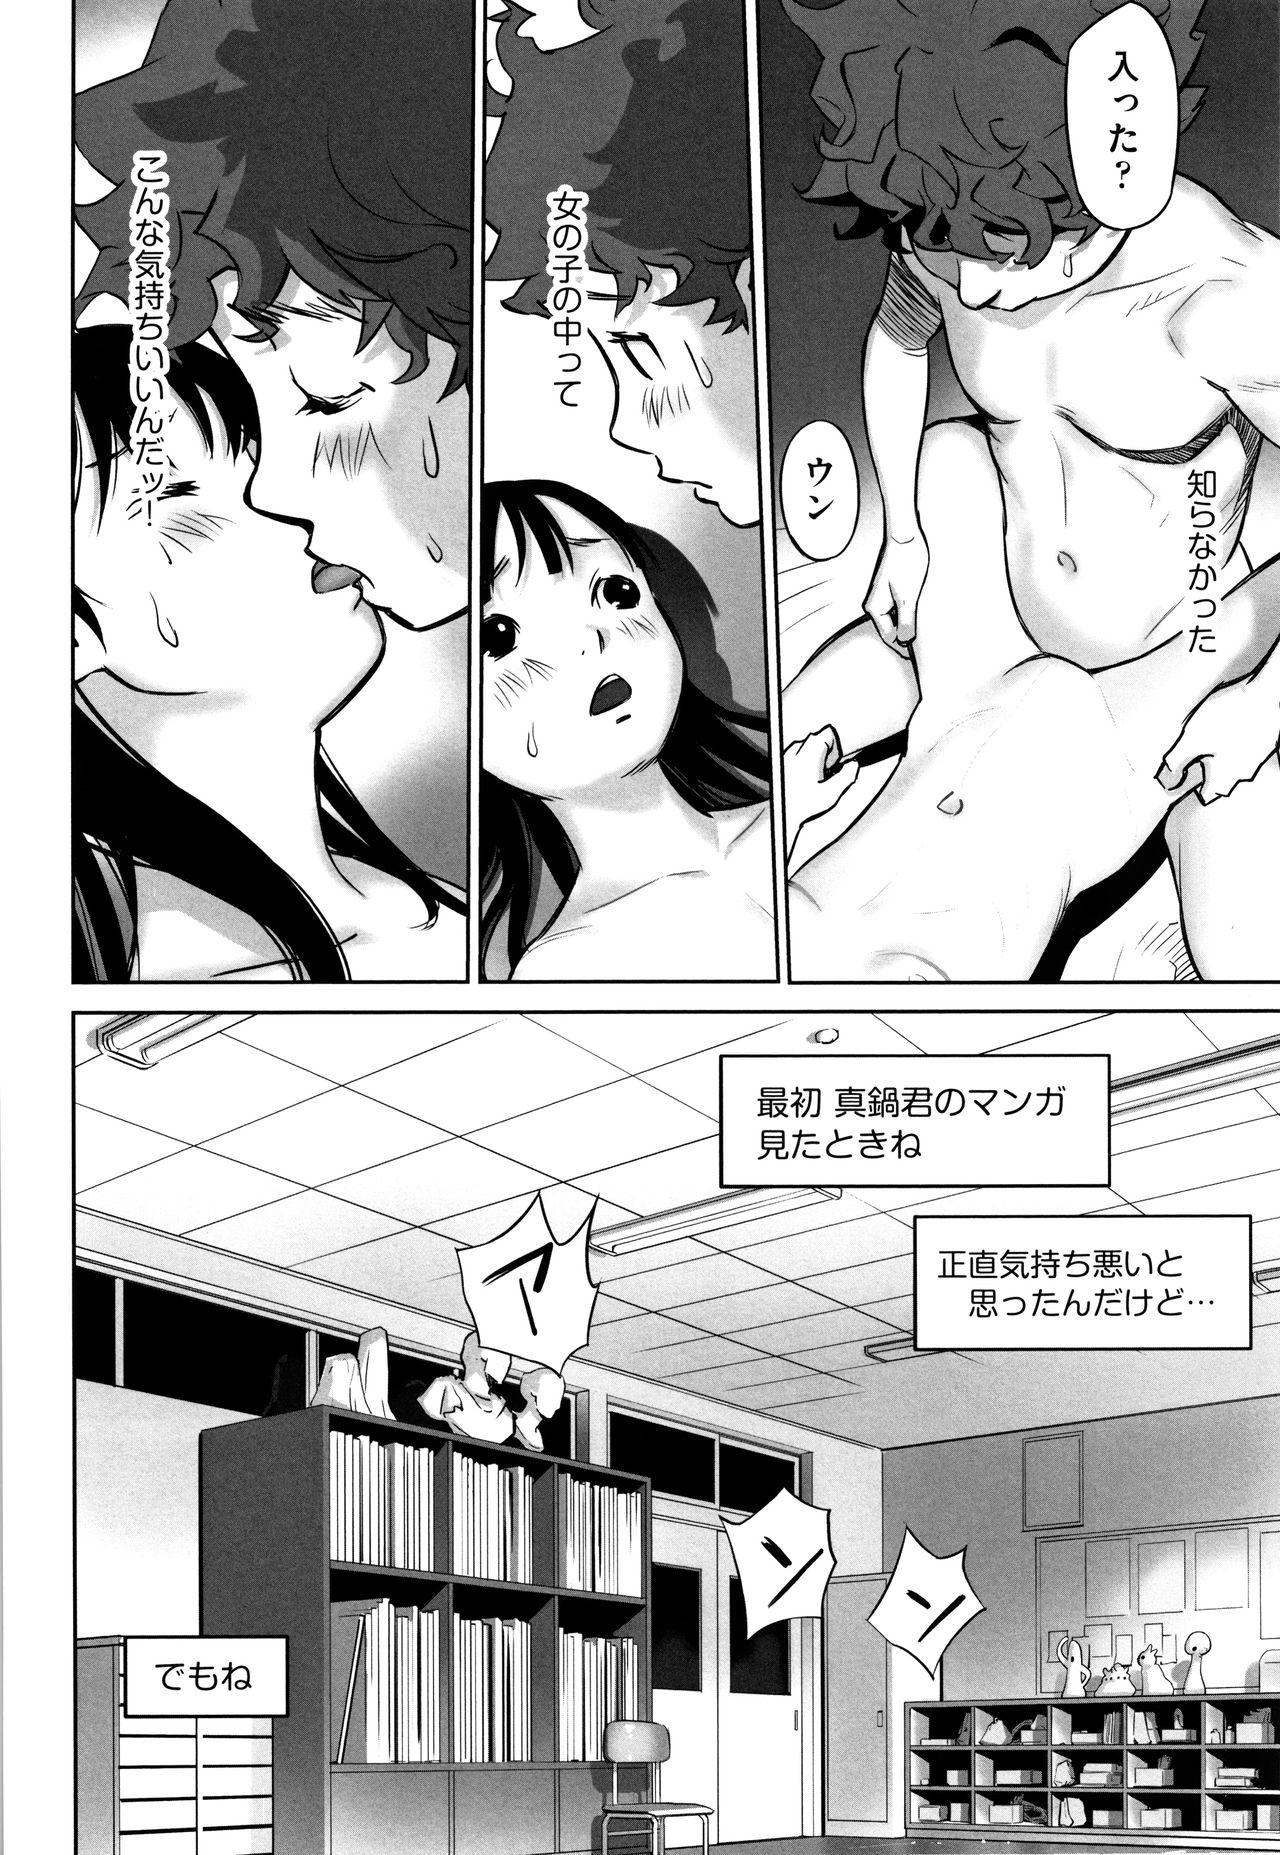 Shoujo Kumikyoku 7 58